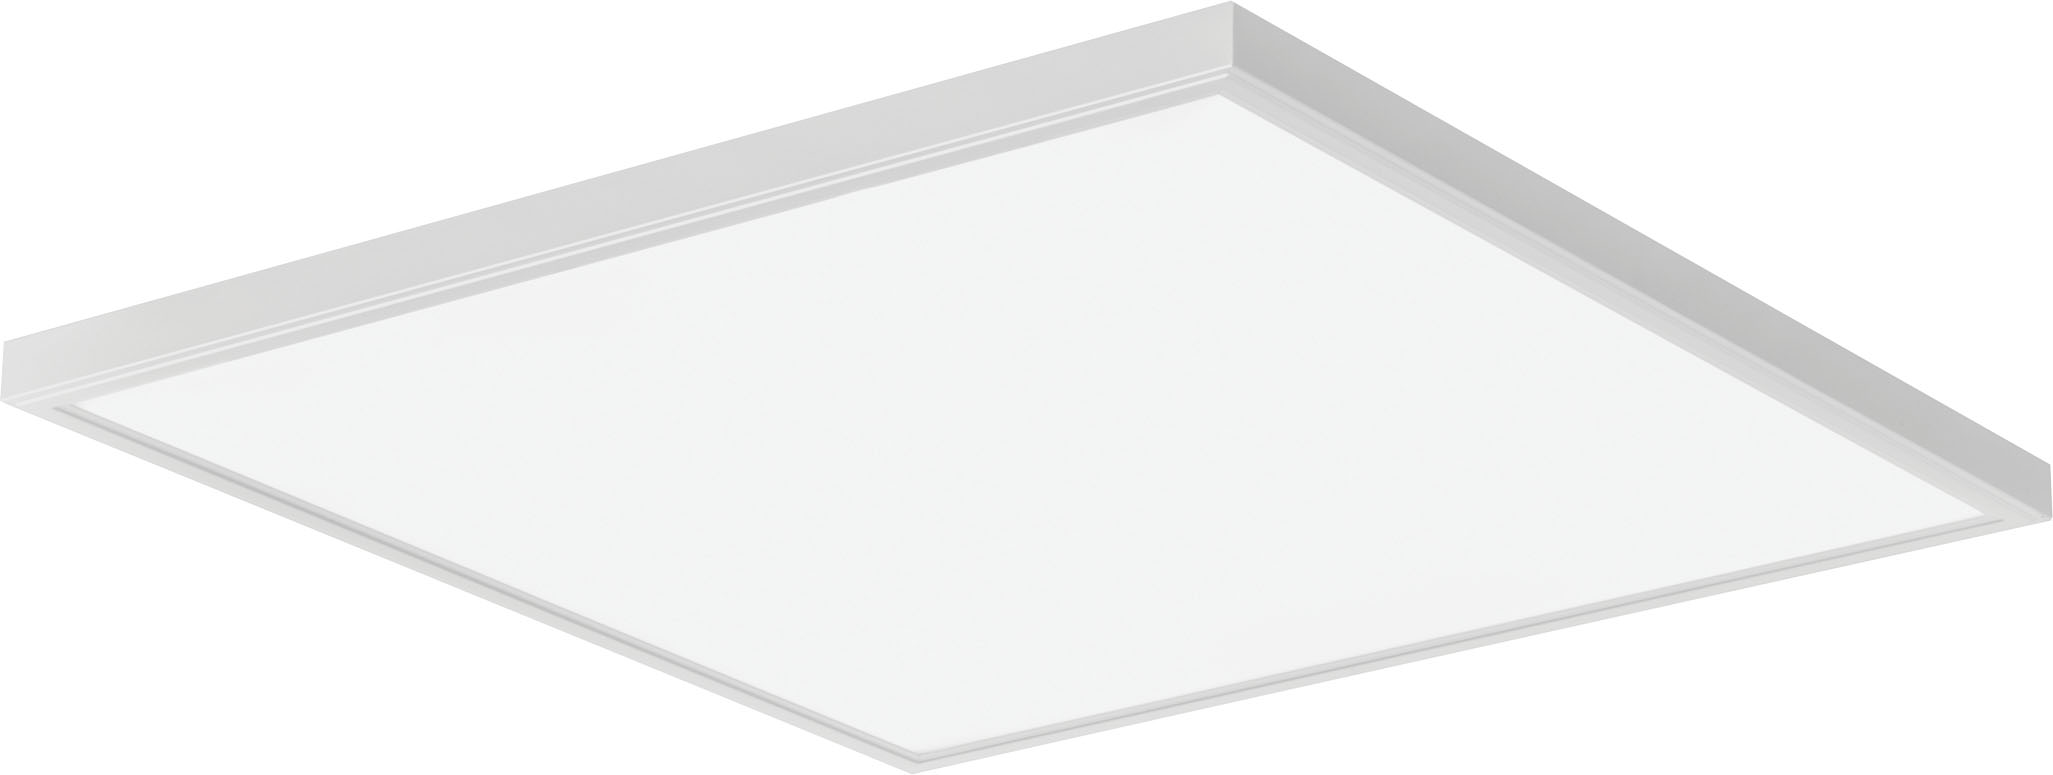 CPANL 2X2_Illuminated